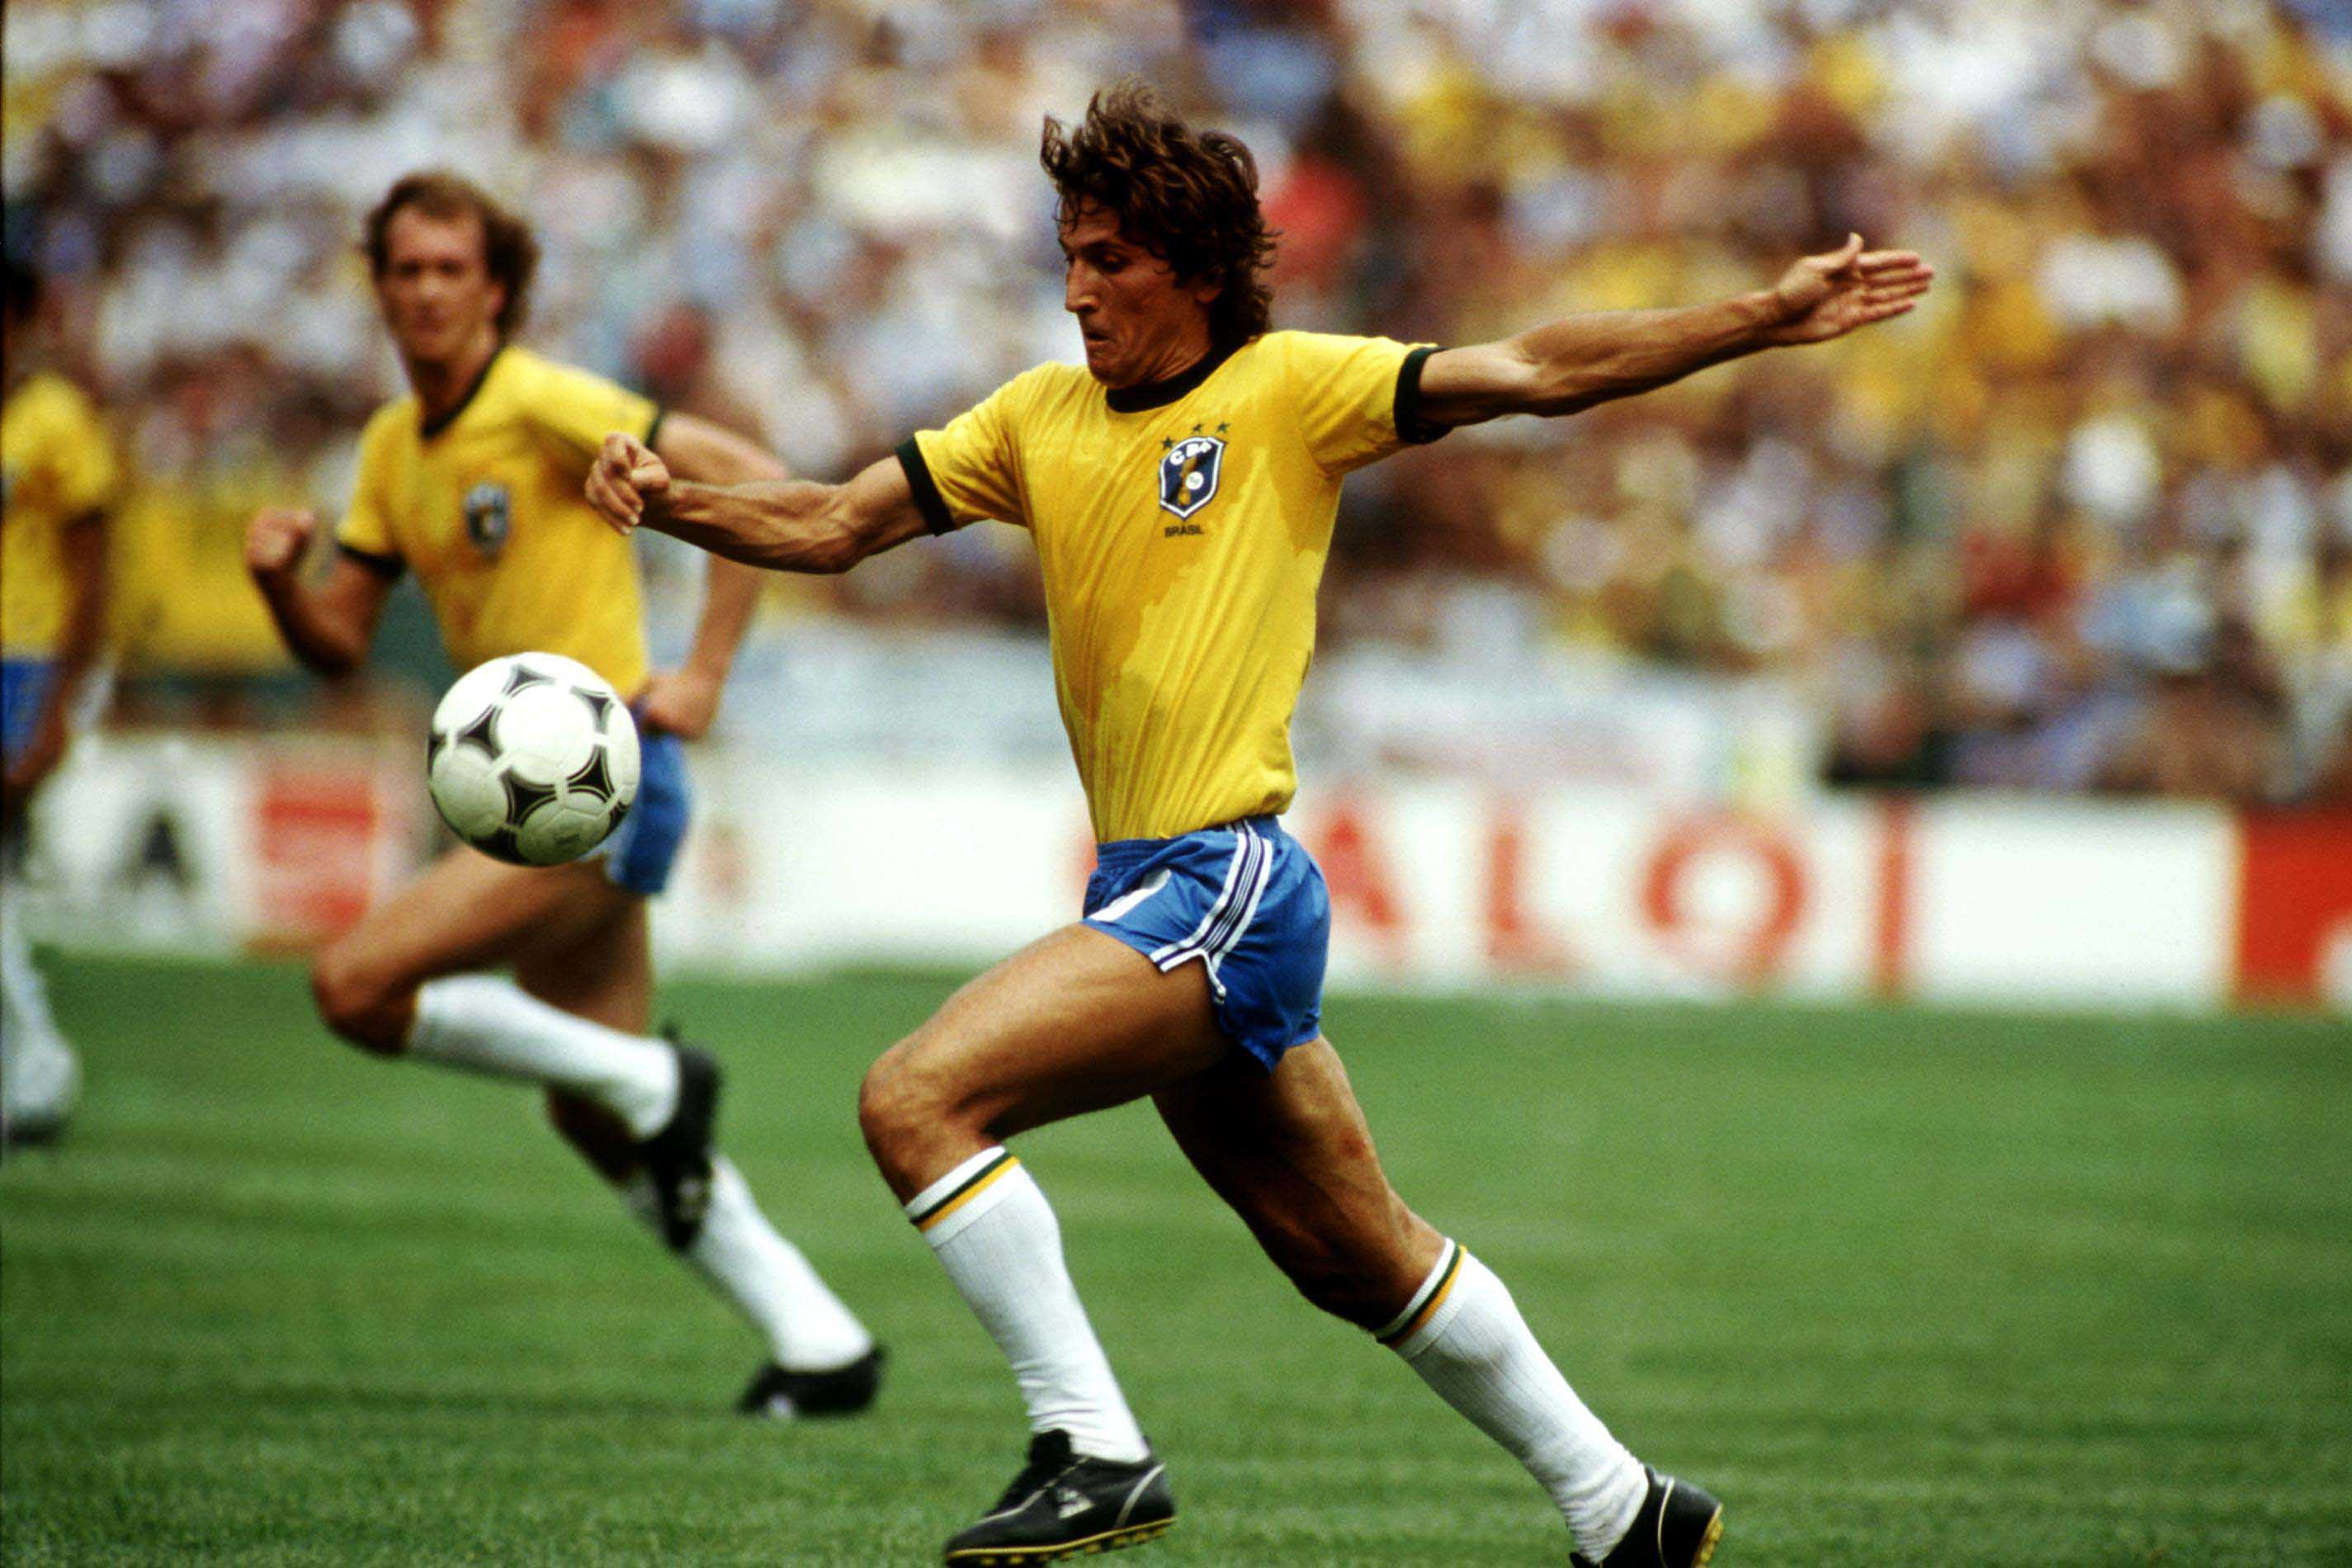 TEENAGE KICKS: THE MAGIC OF BRAZIL '82